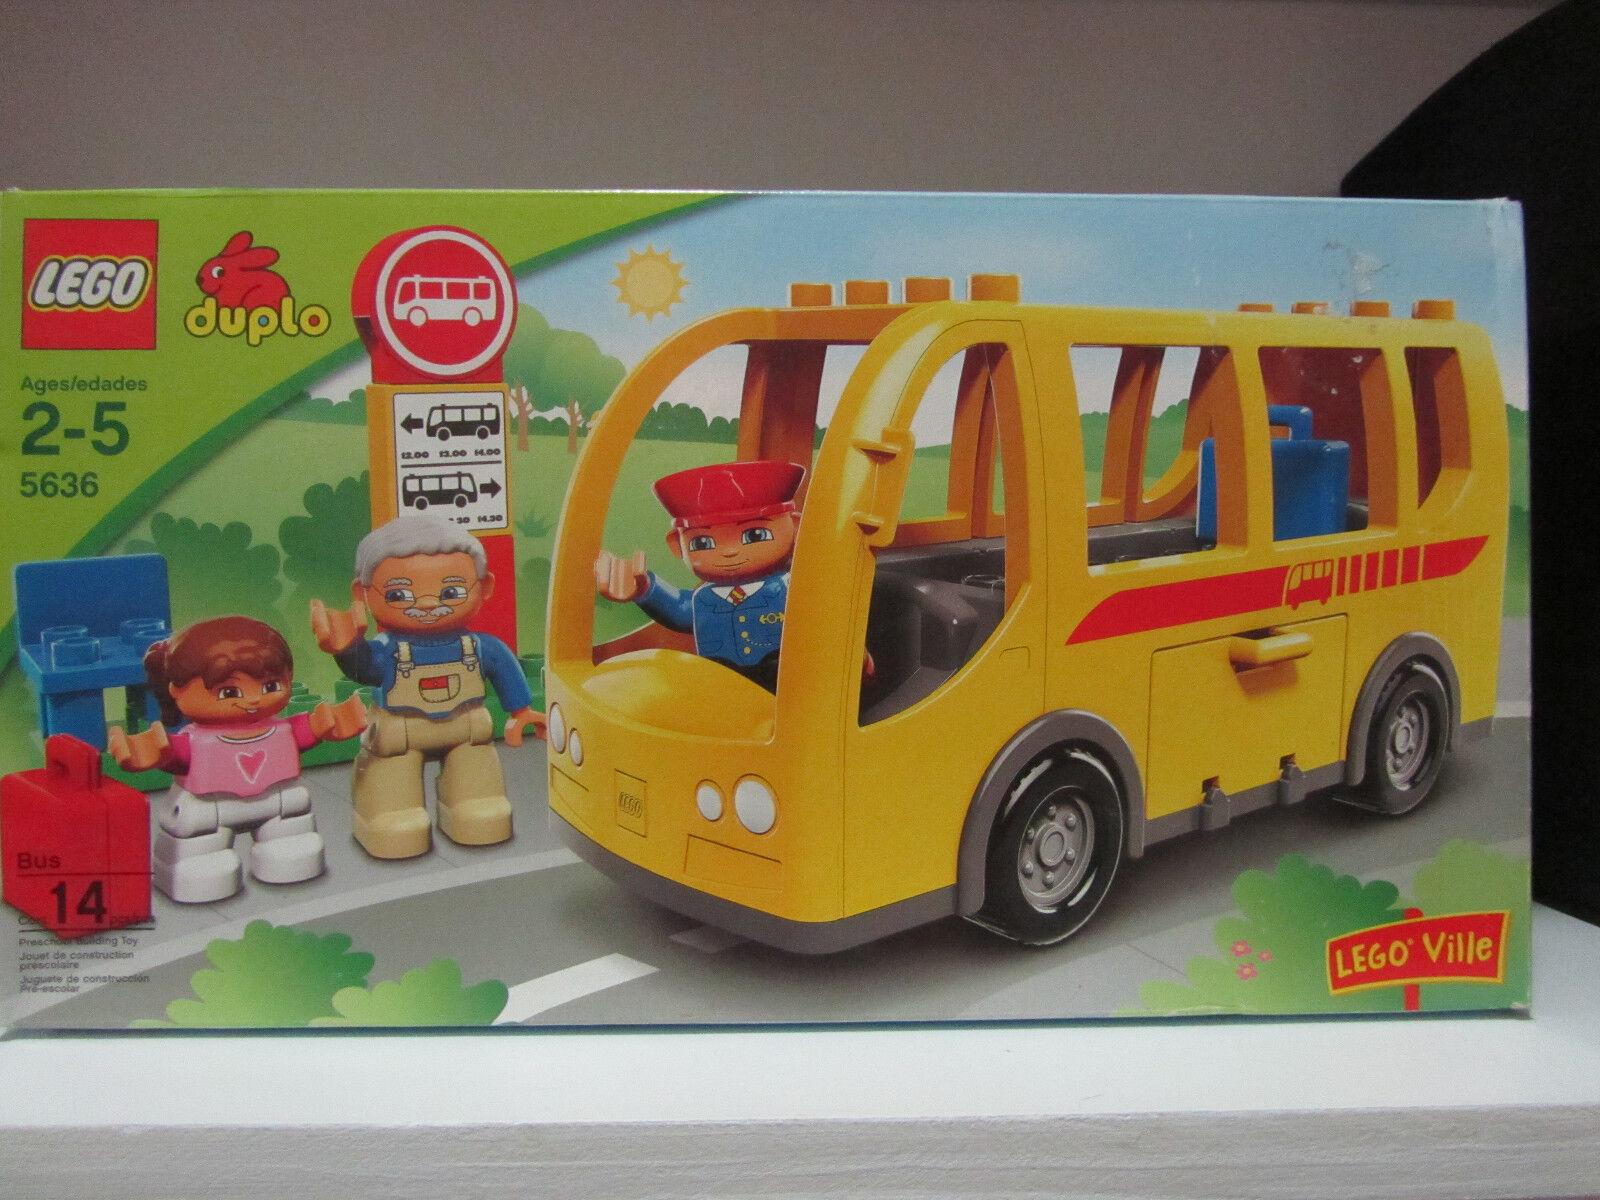 Lego Duplo Lego Ville 5636 5636 5636 Big School Bus Vehicle People  NEW SEALED   Lot Set 425562